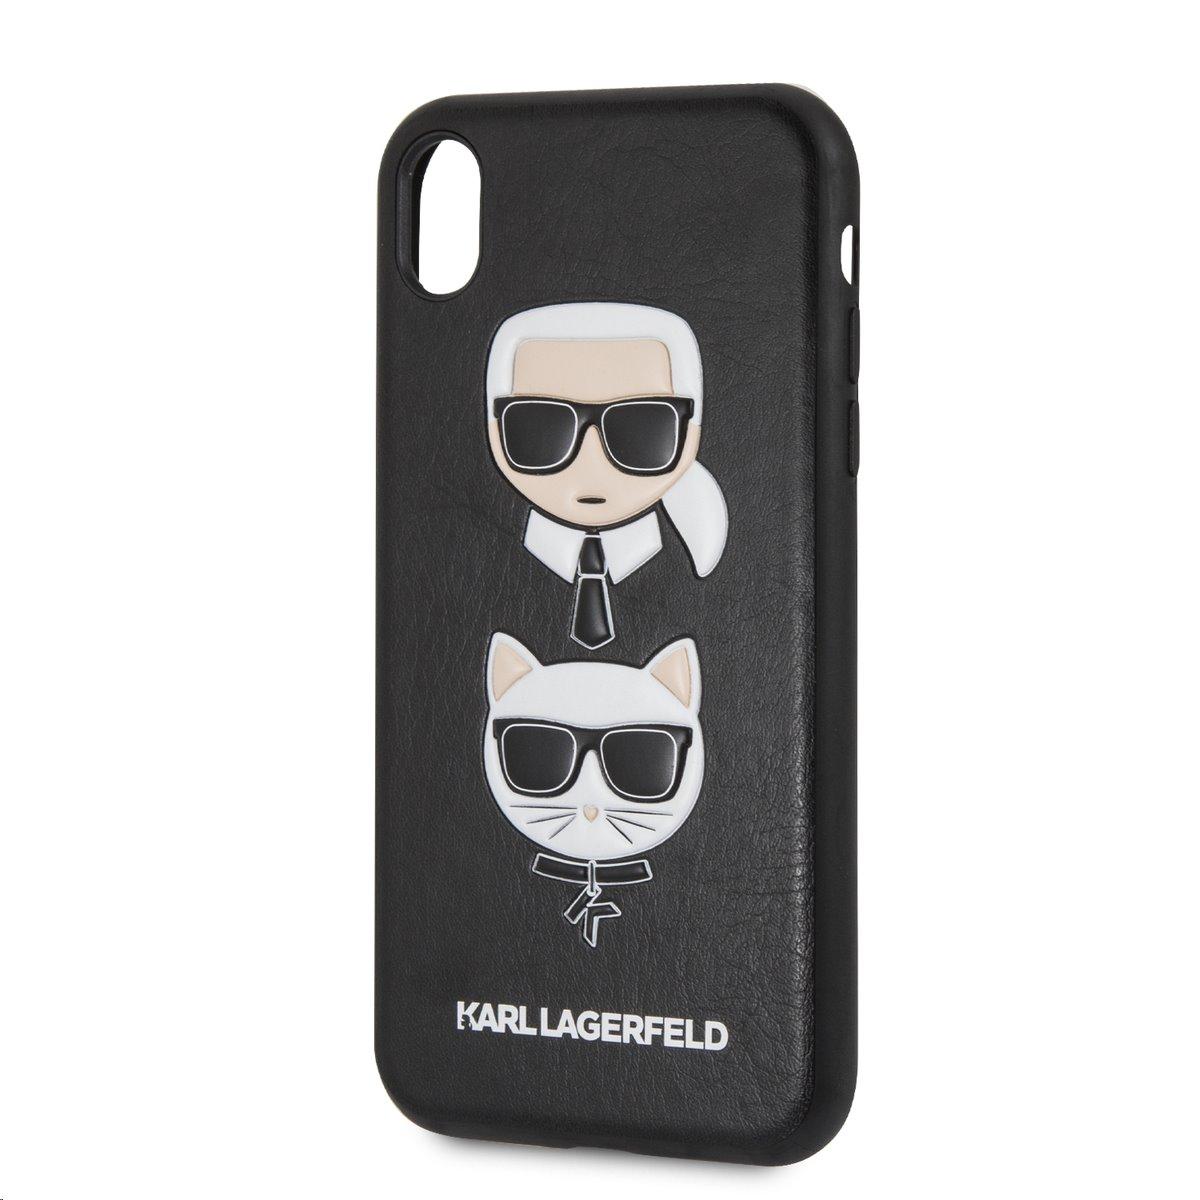 Silikonové pouzdro Karl Lagerfeld Karl and Choupette Hard Case na iPhone XR, Black